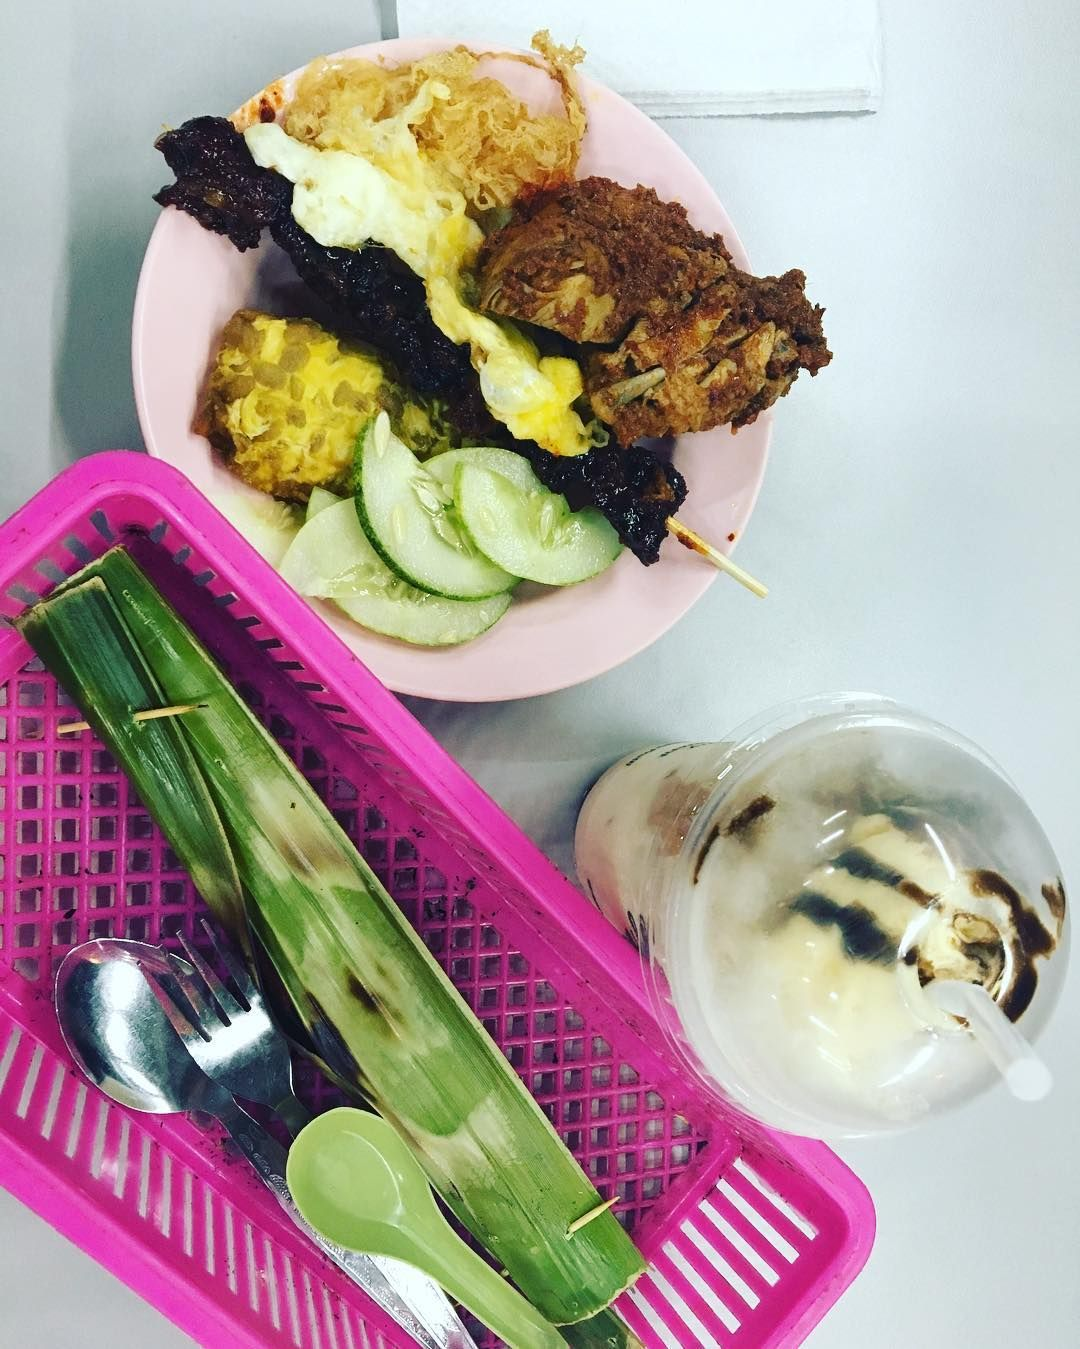 #marketfood #malaystyle by victoria.j.ren